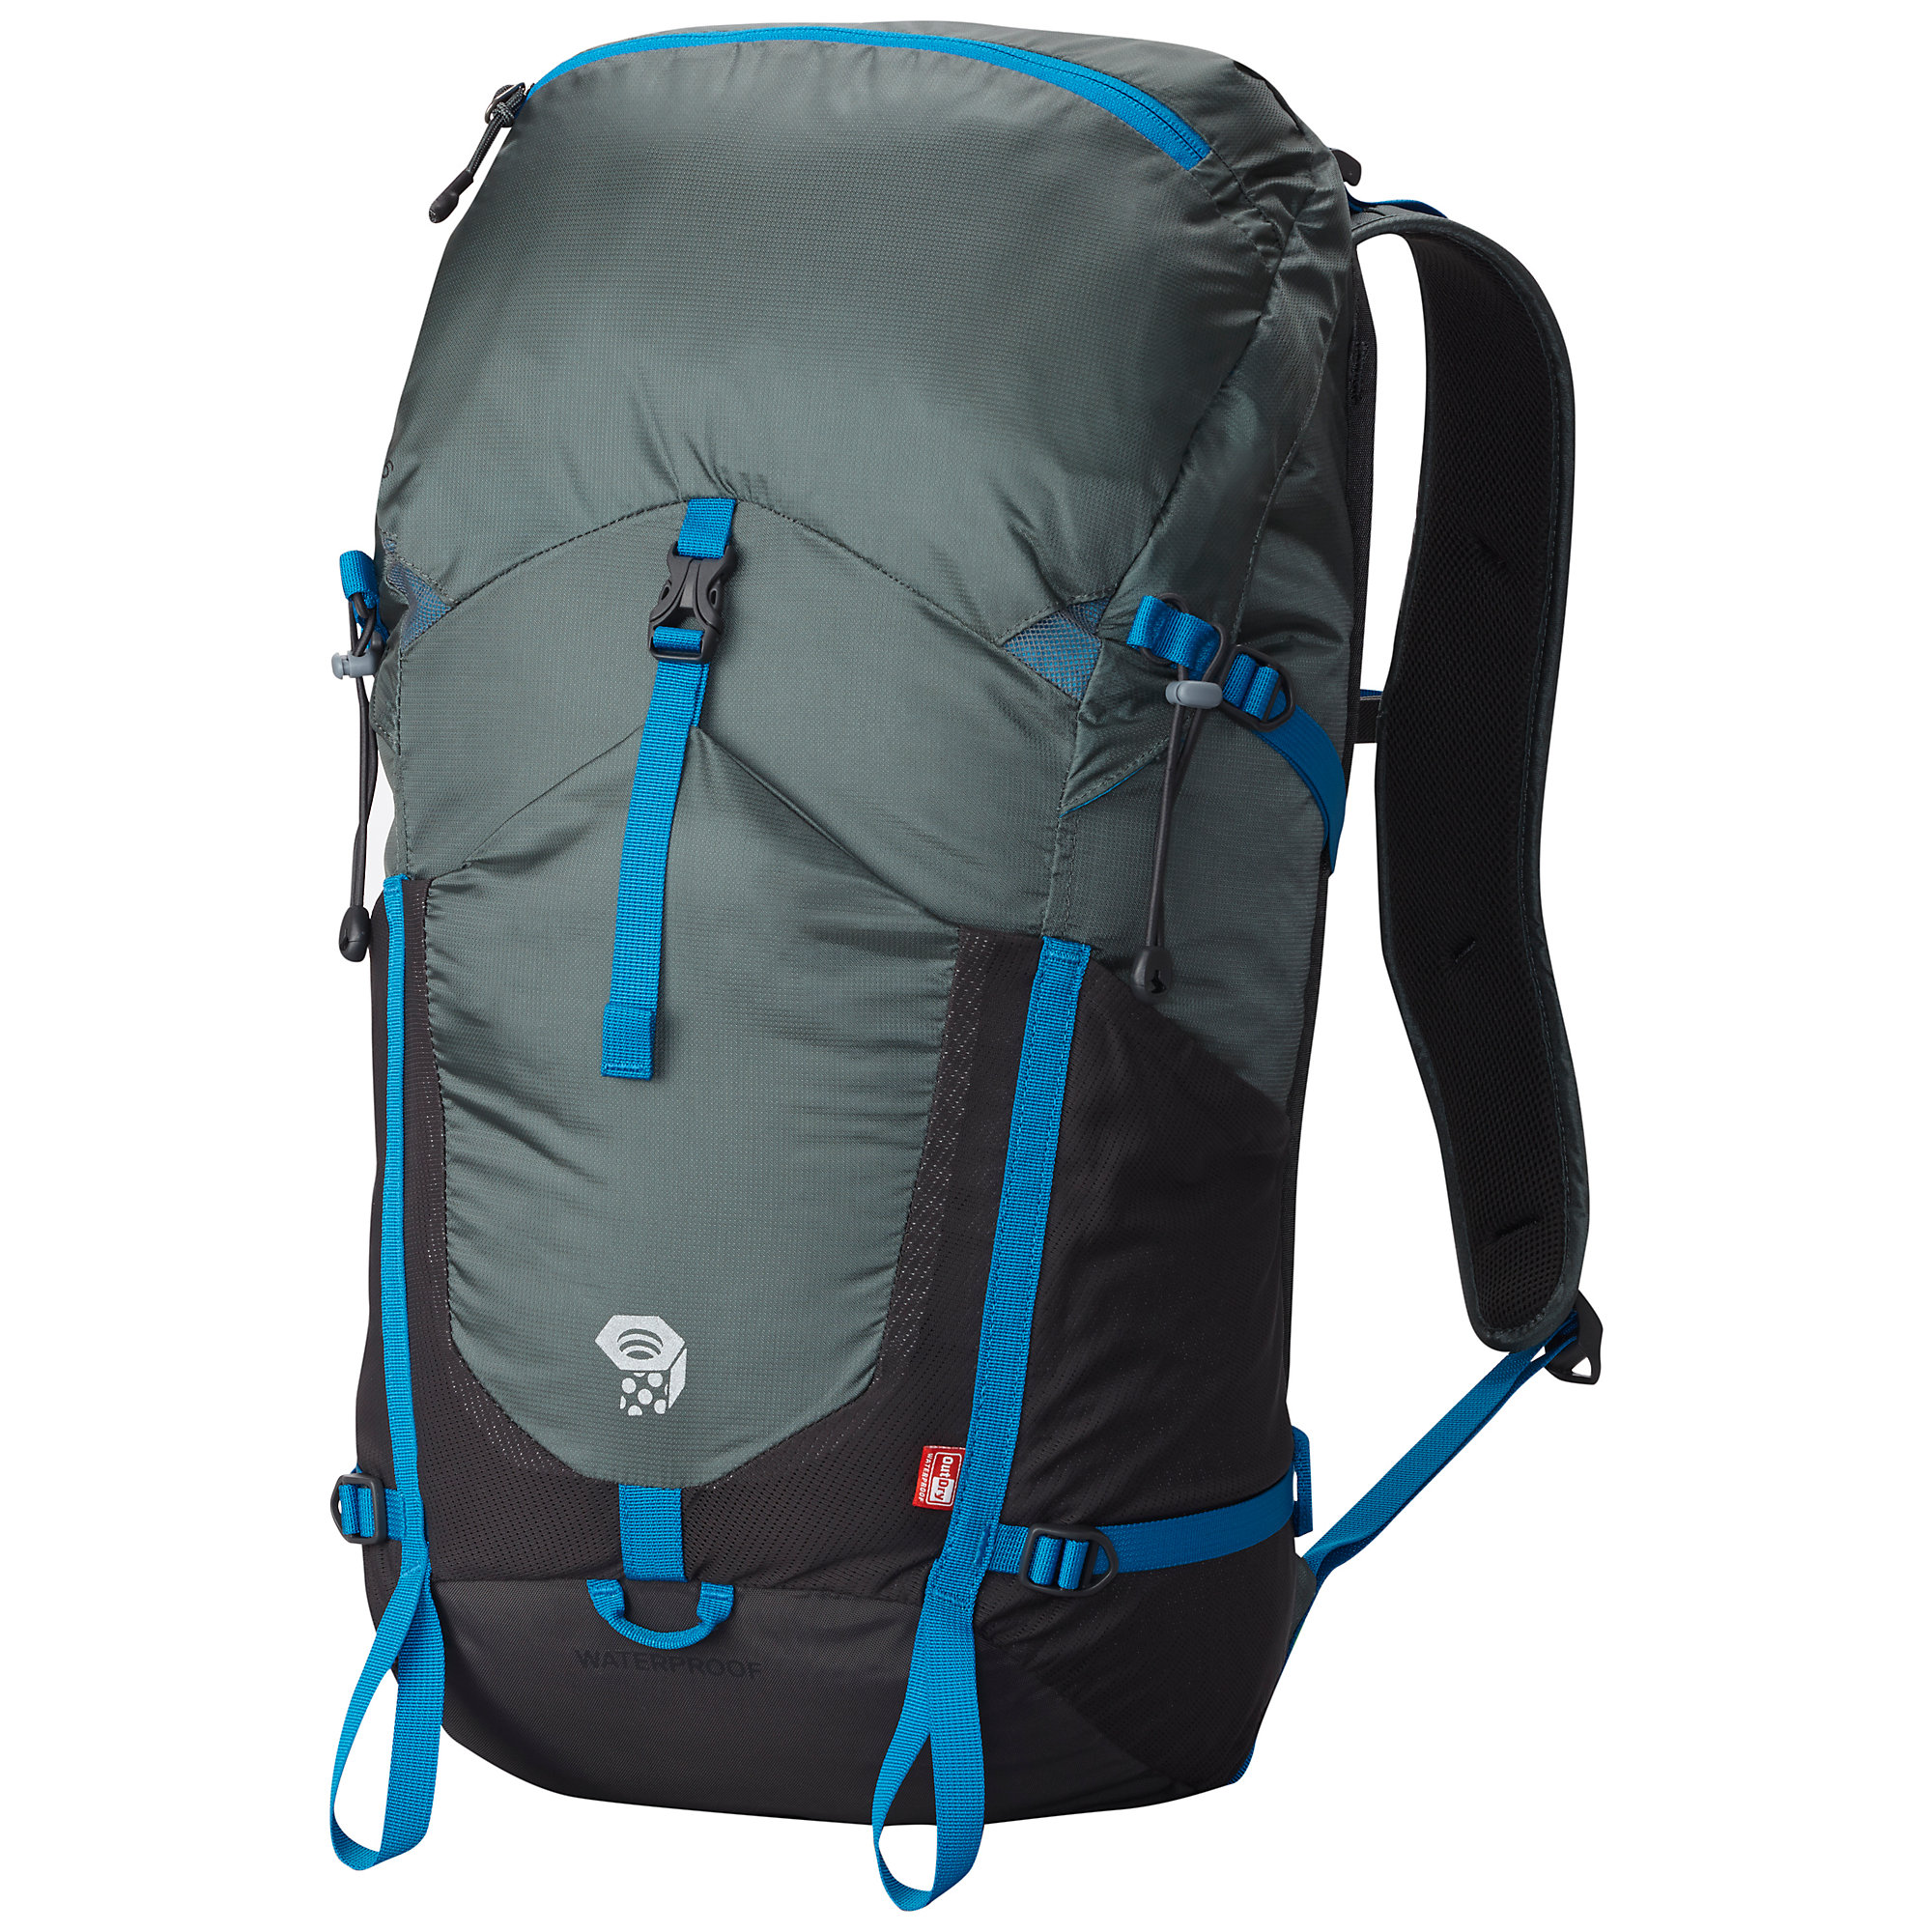 Mountain Hardwear Rainshadow 26 OutDry